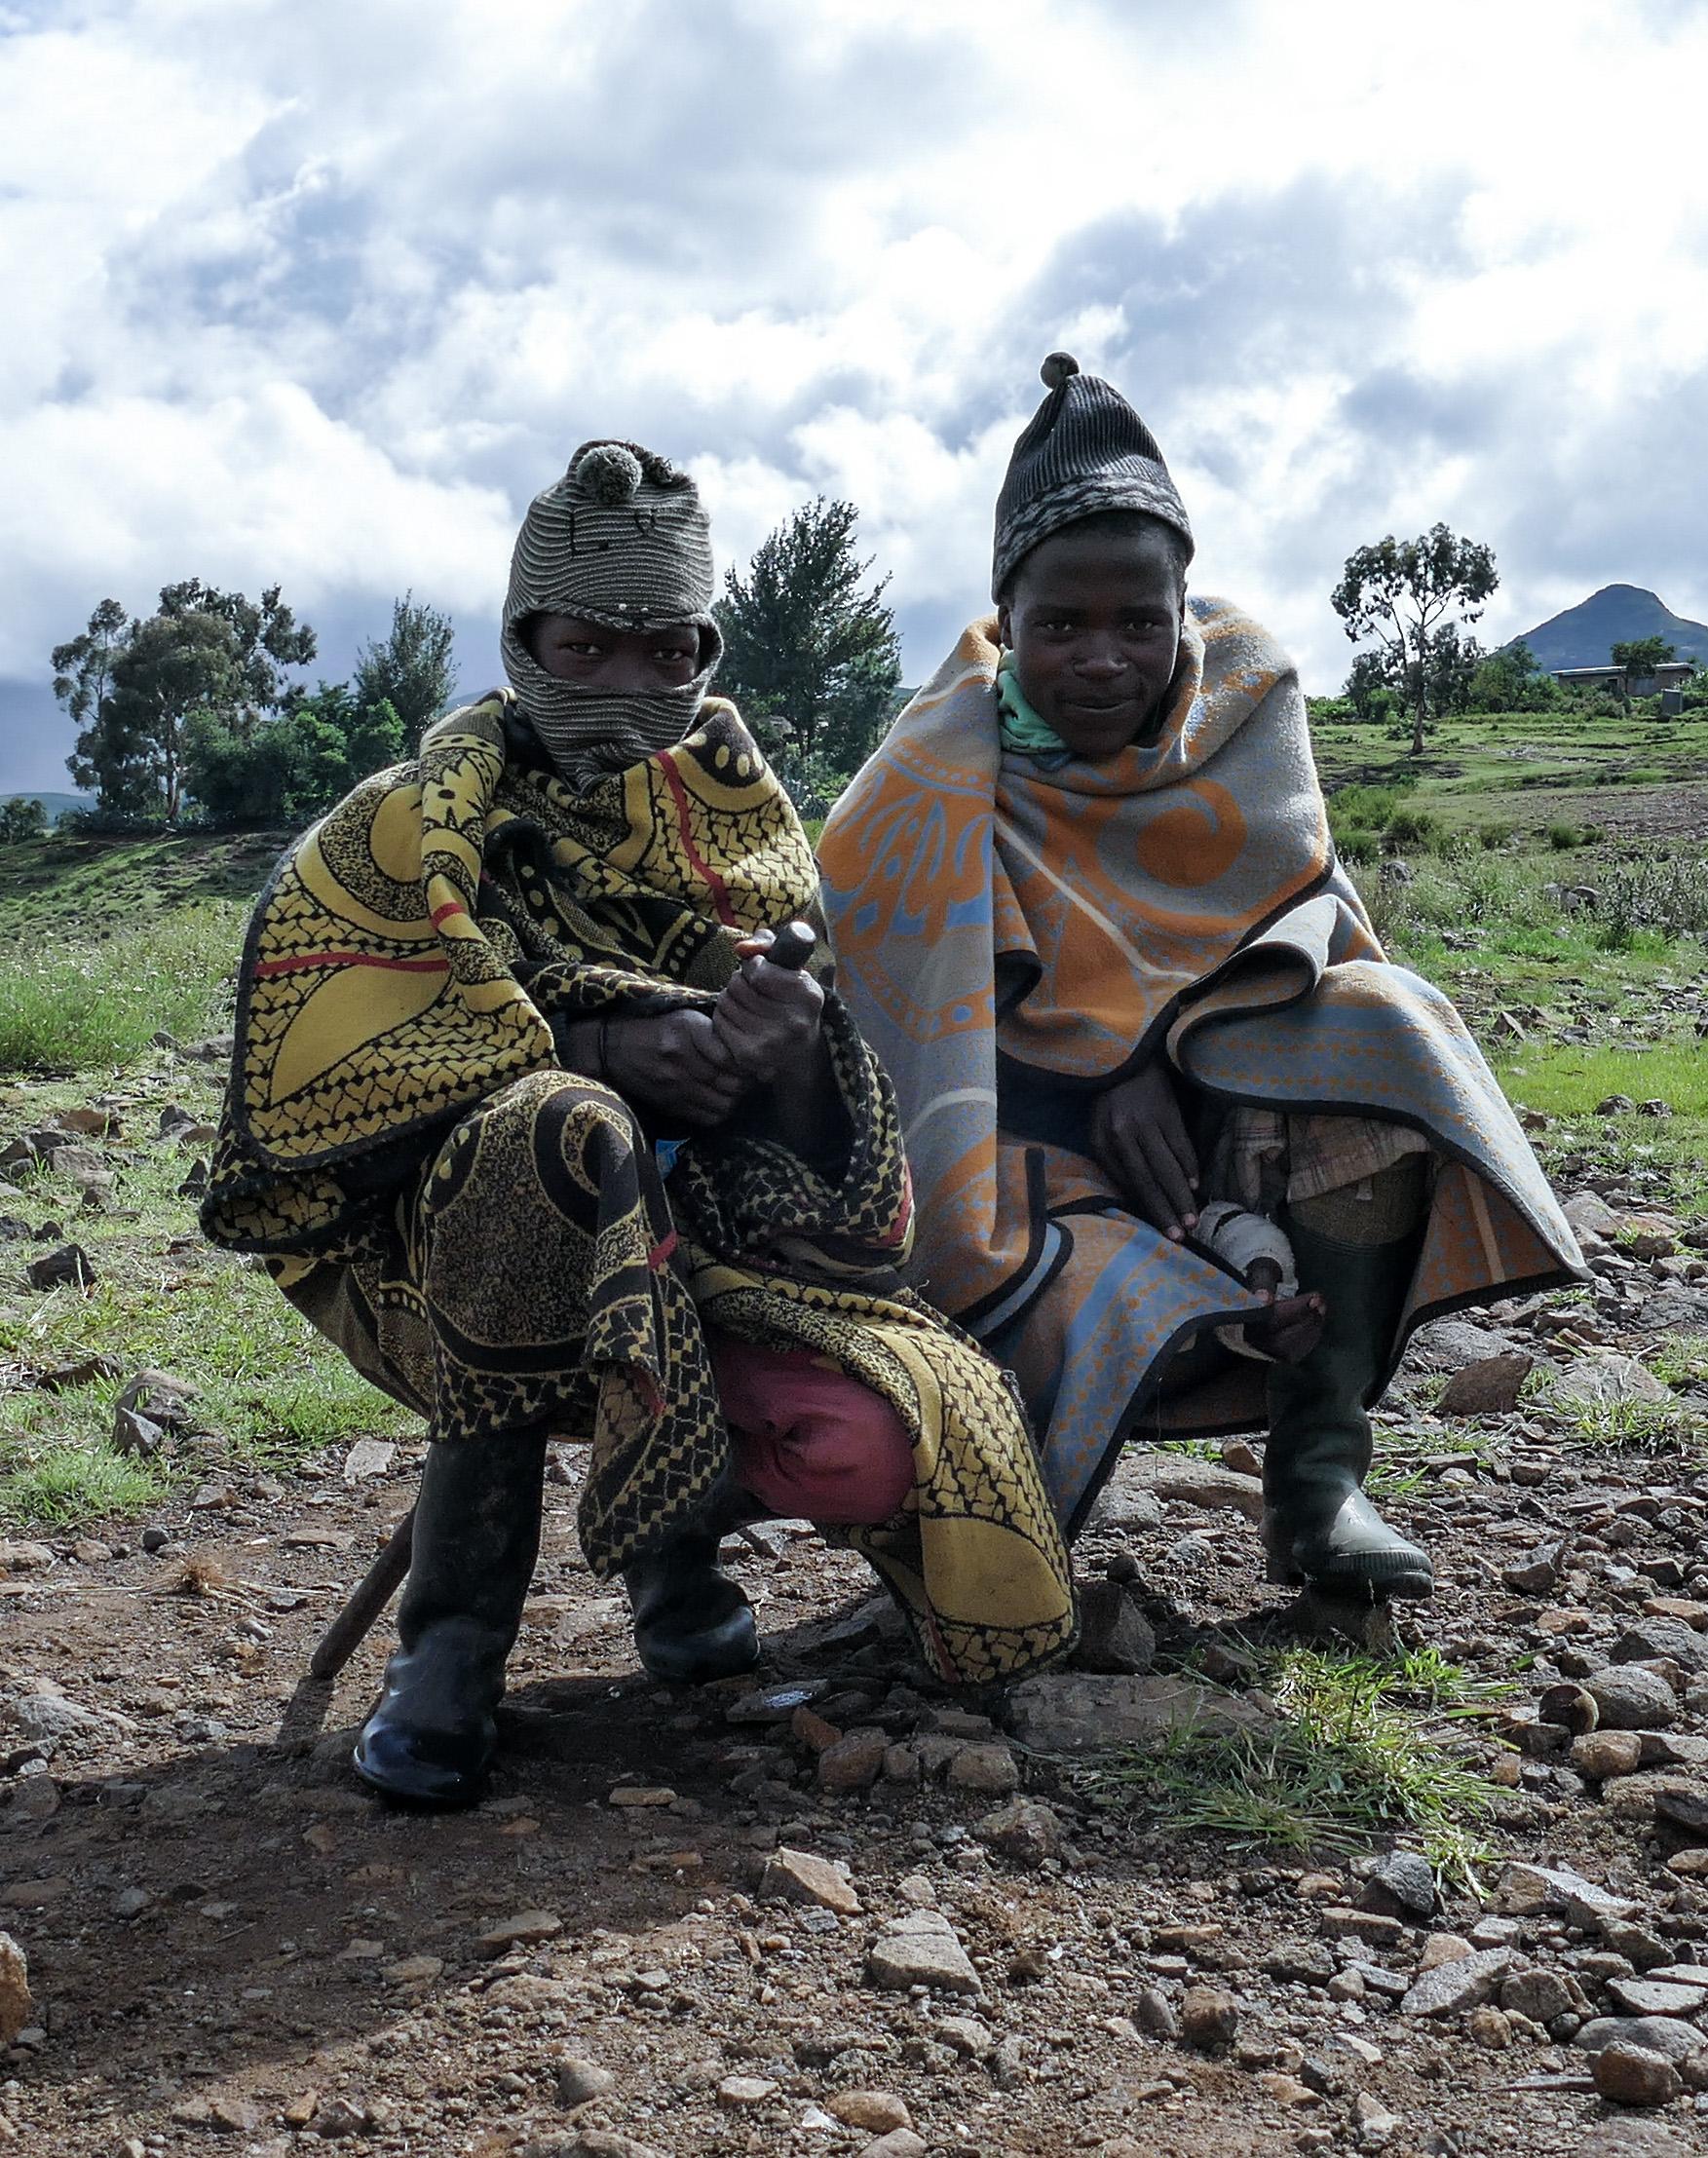 Basotho shepherds boys wearing traditional Basotho blankets